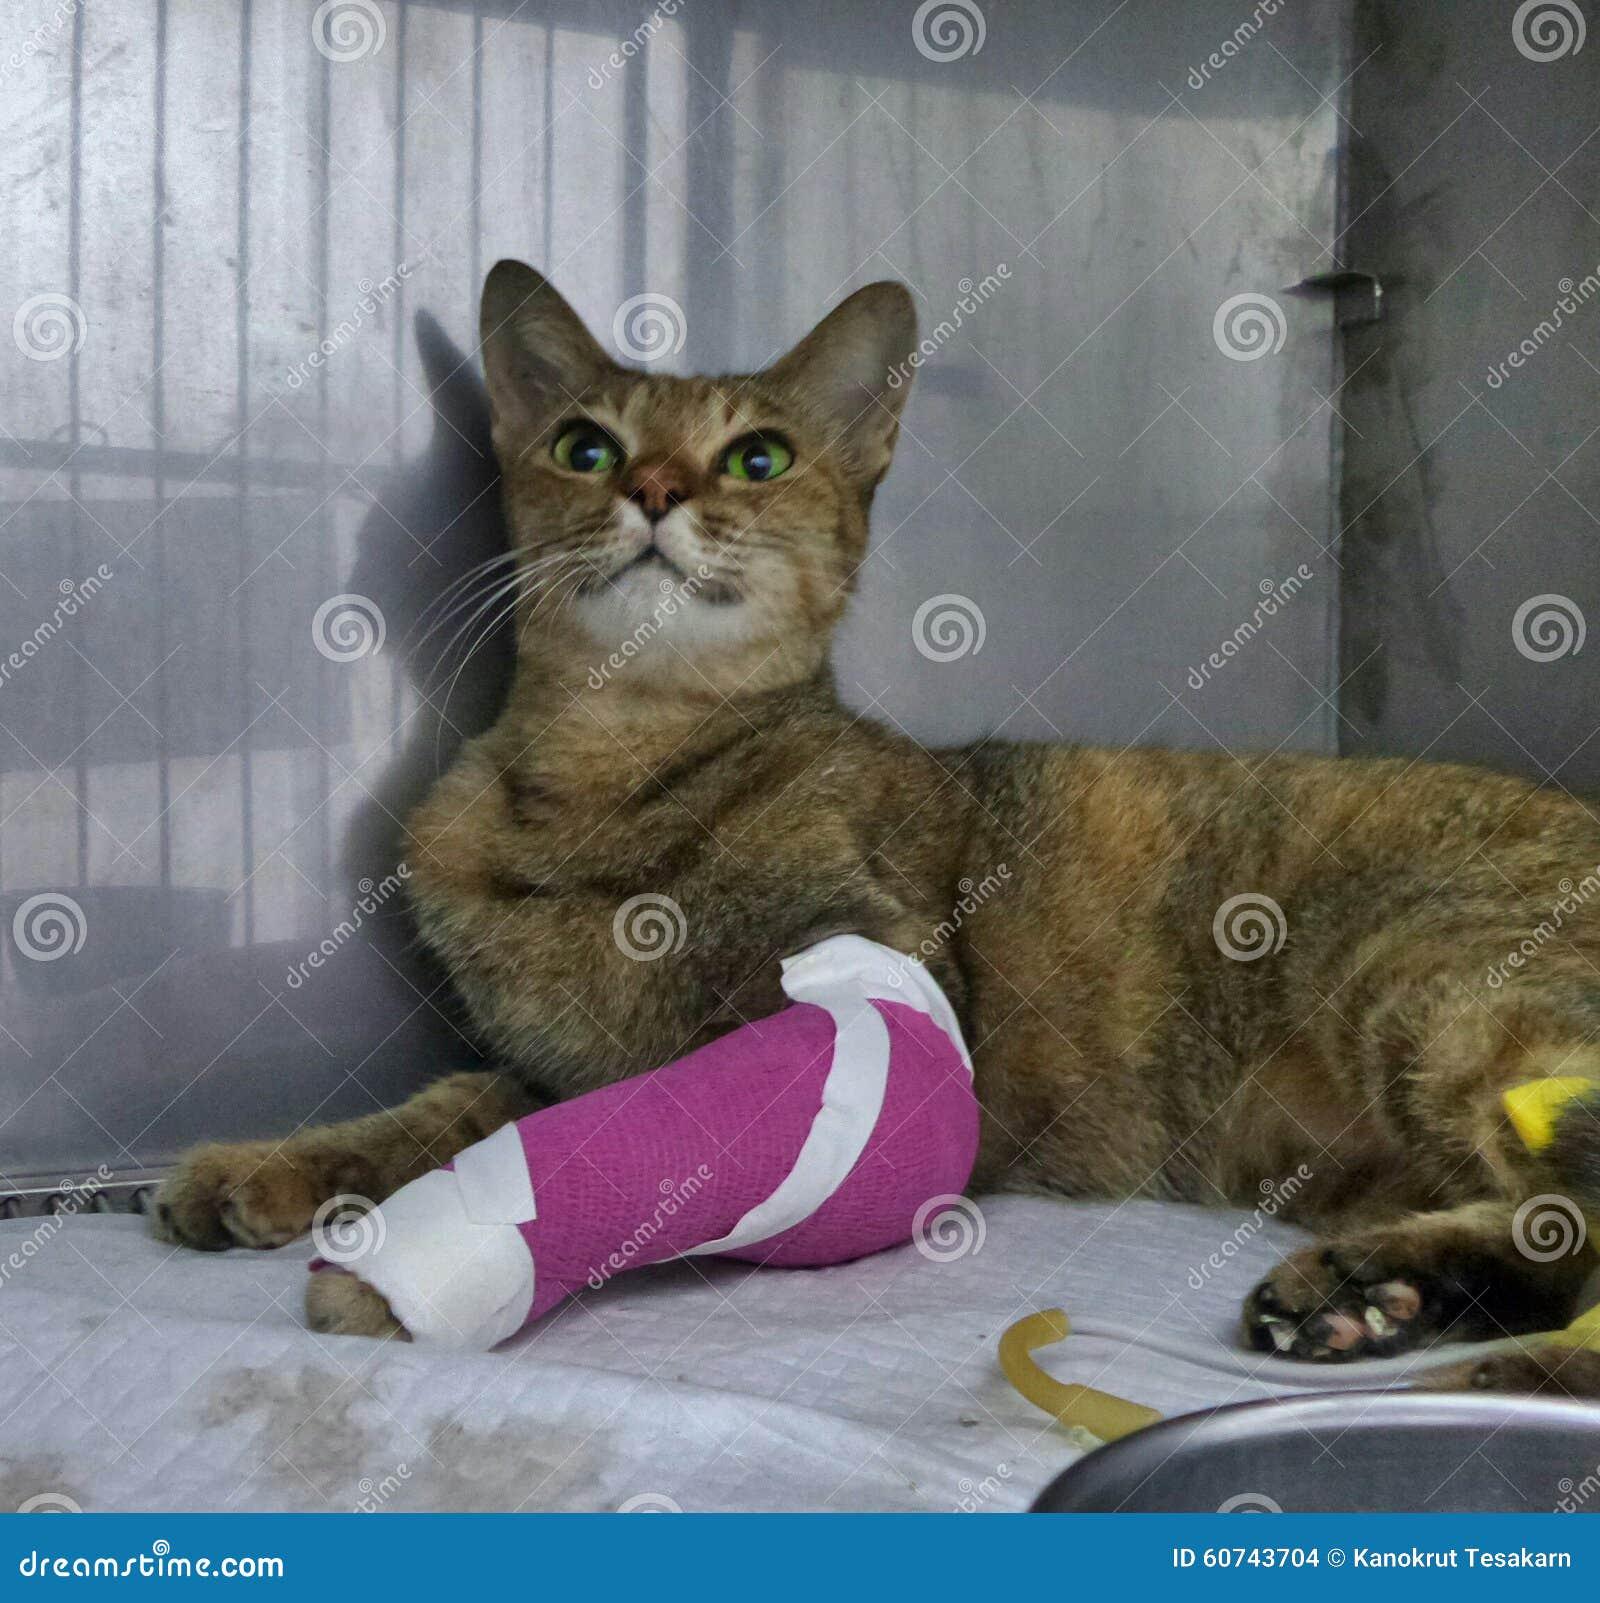 siamese kittens for sale ohio